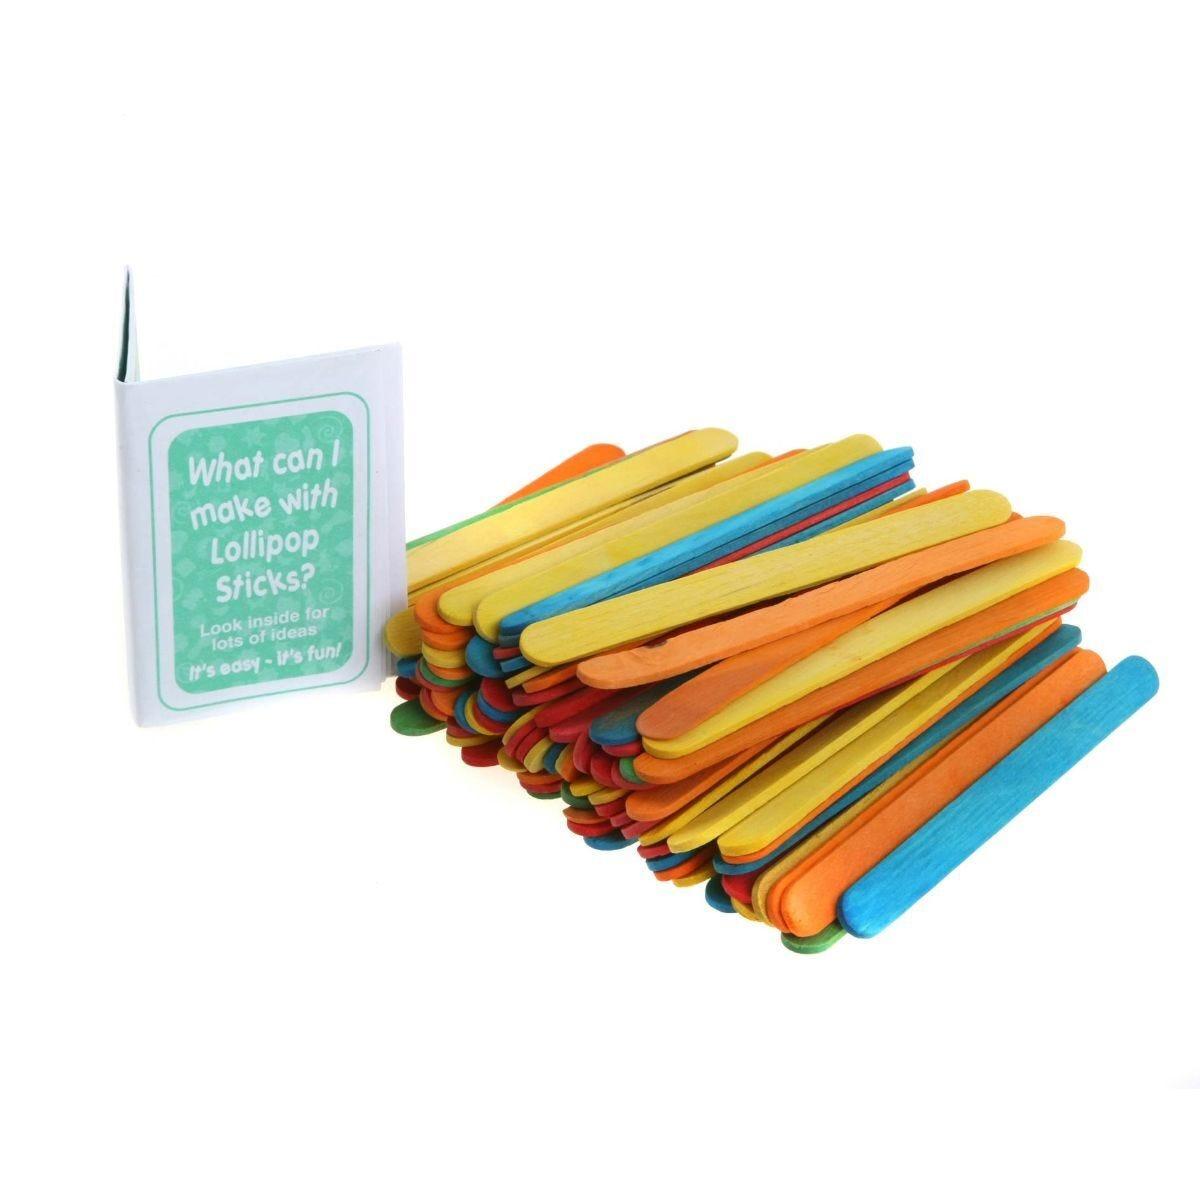 Ryman Activity Kit Lollipop